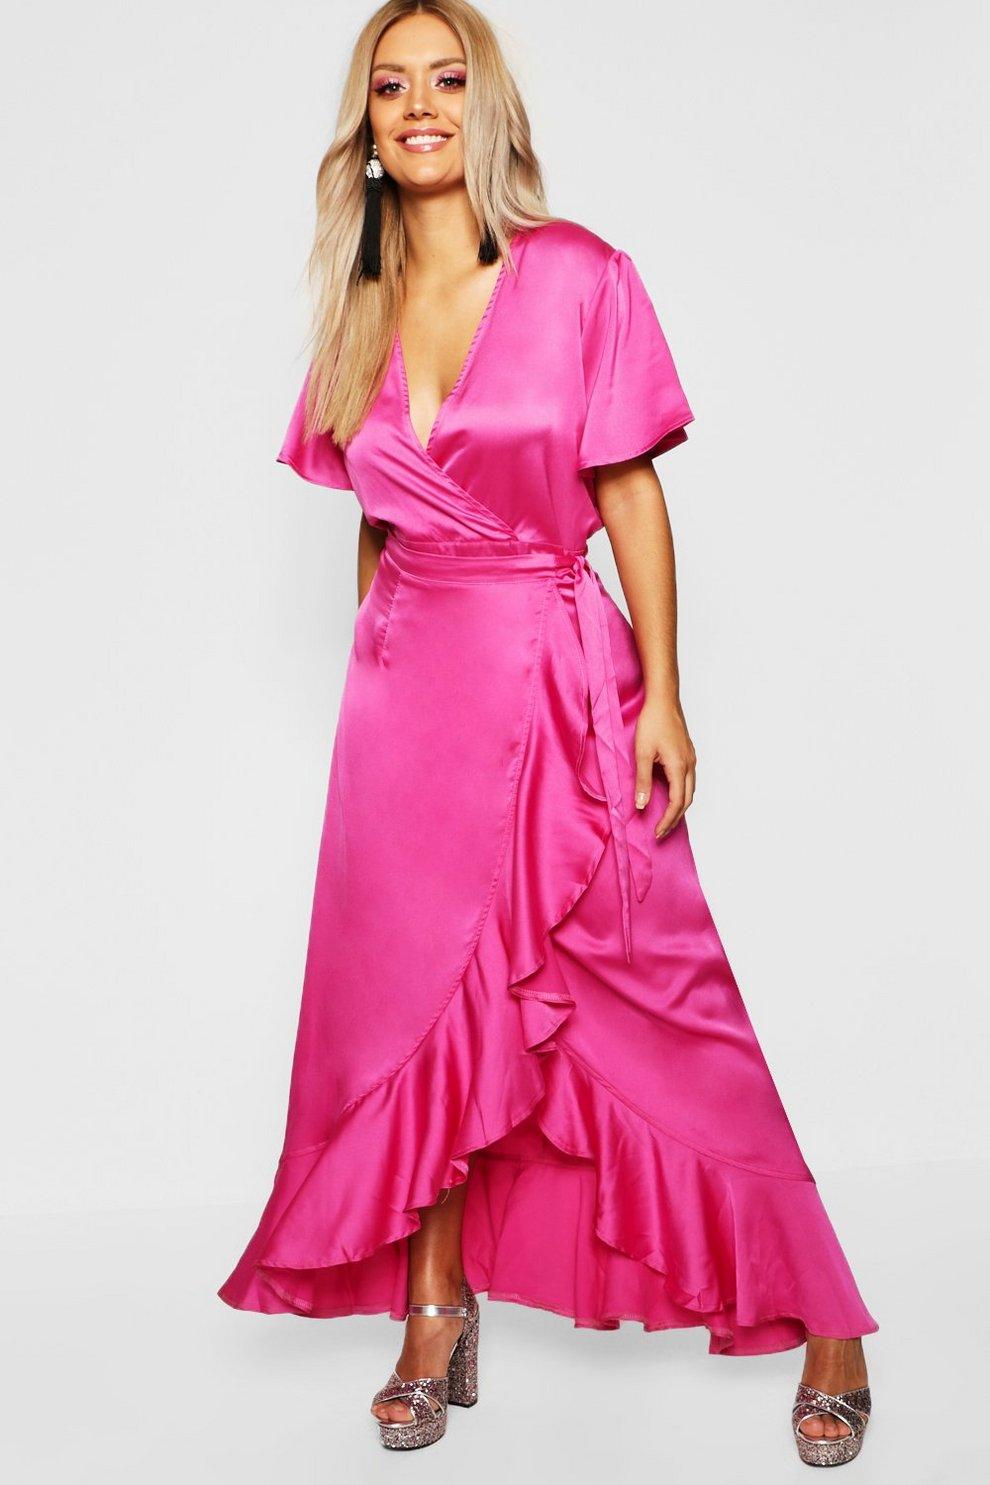 217b32469c4 Gemma Collins Satin Ruffle Wrap Maxi Dress